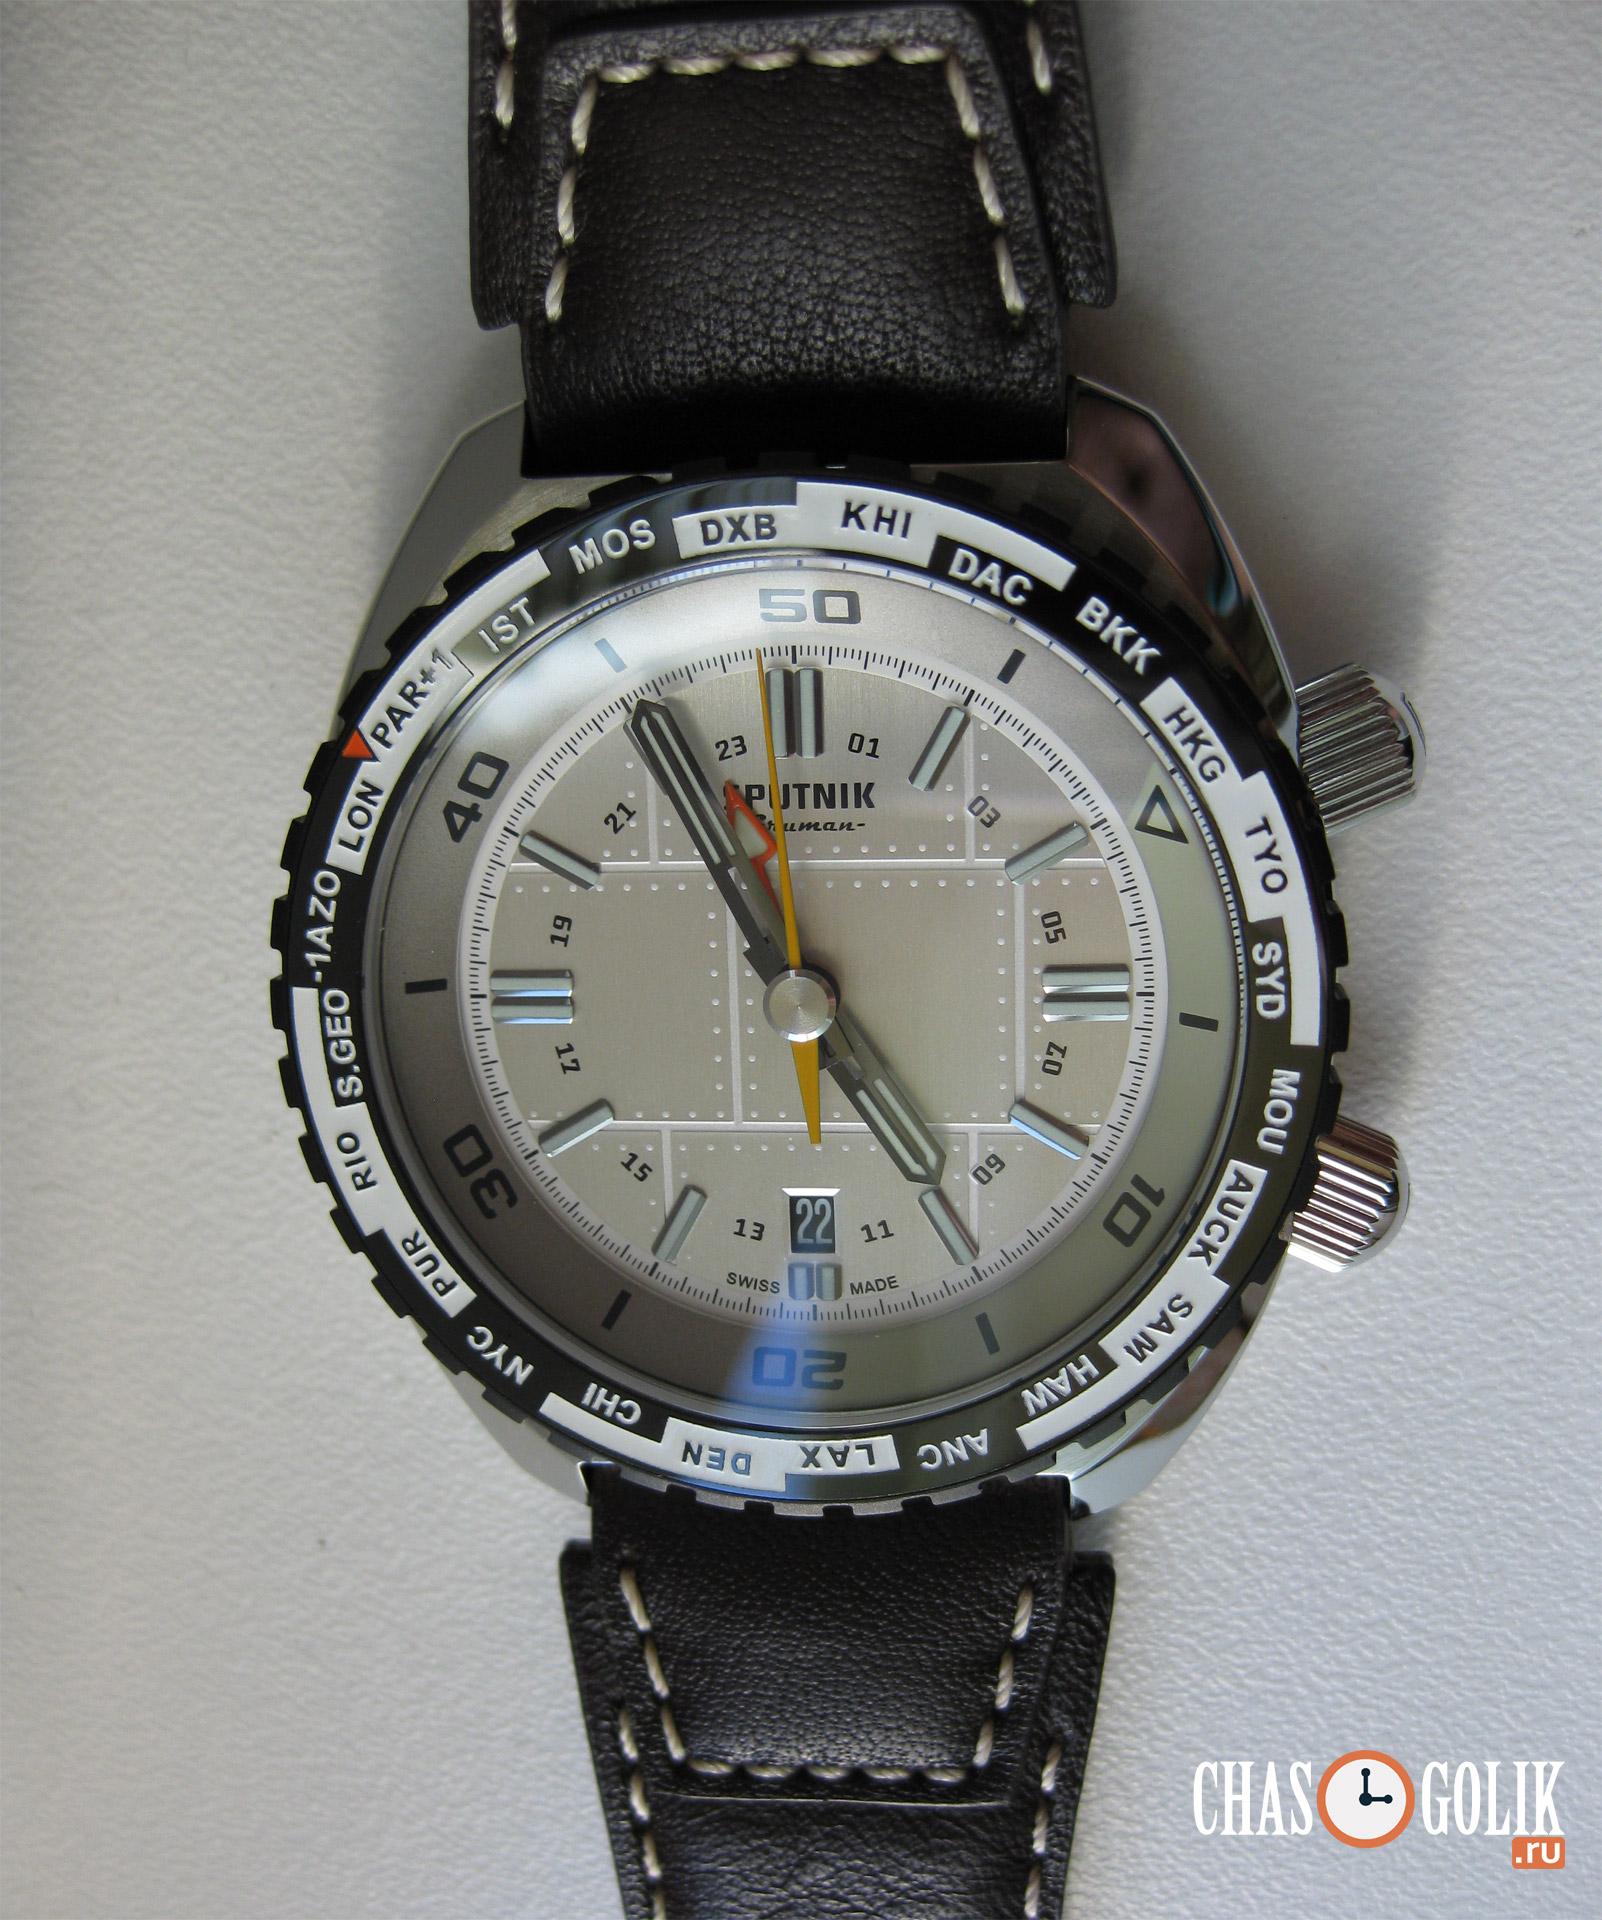 Gruman Sputnik GMT